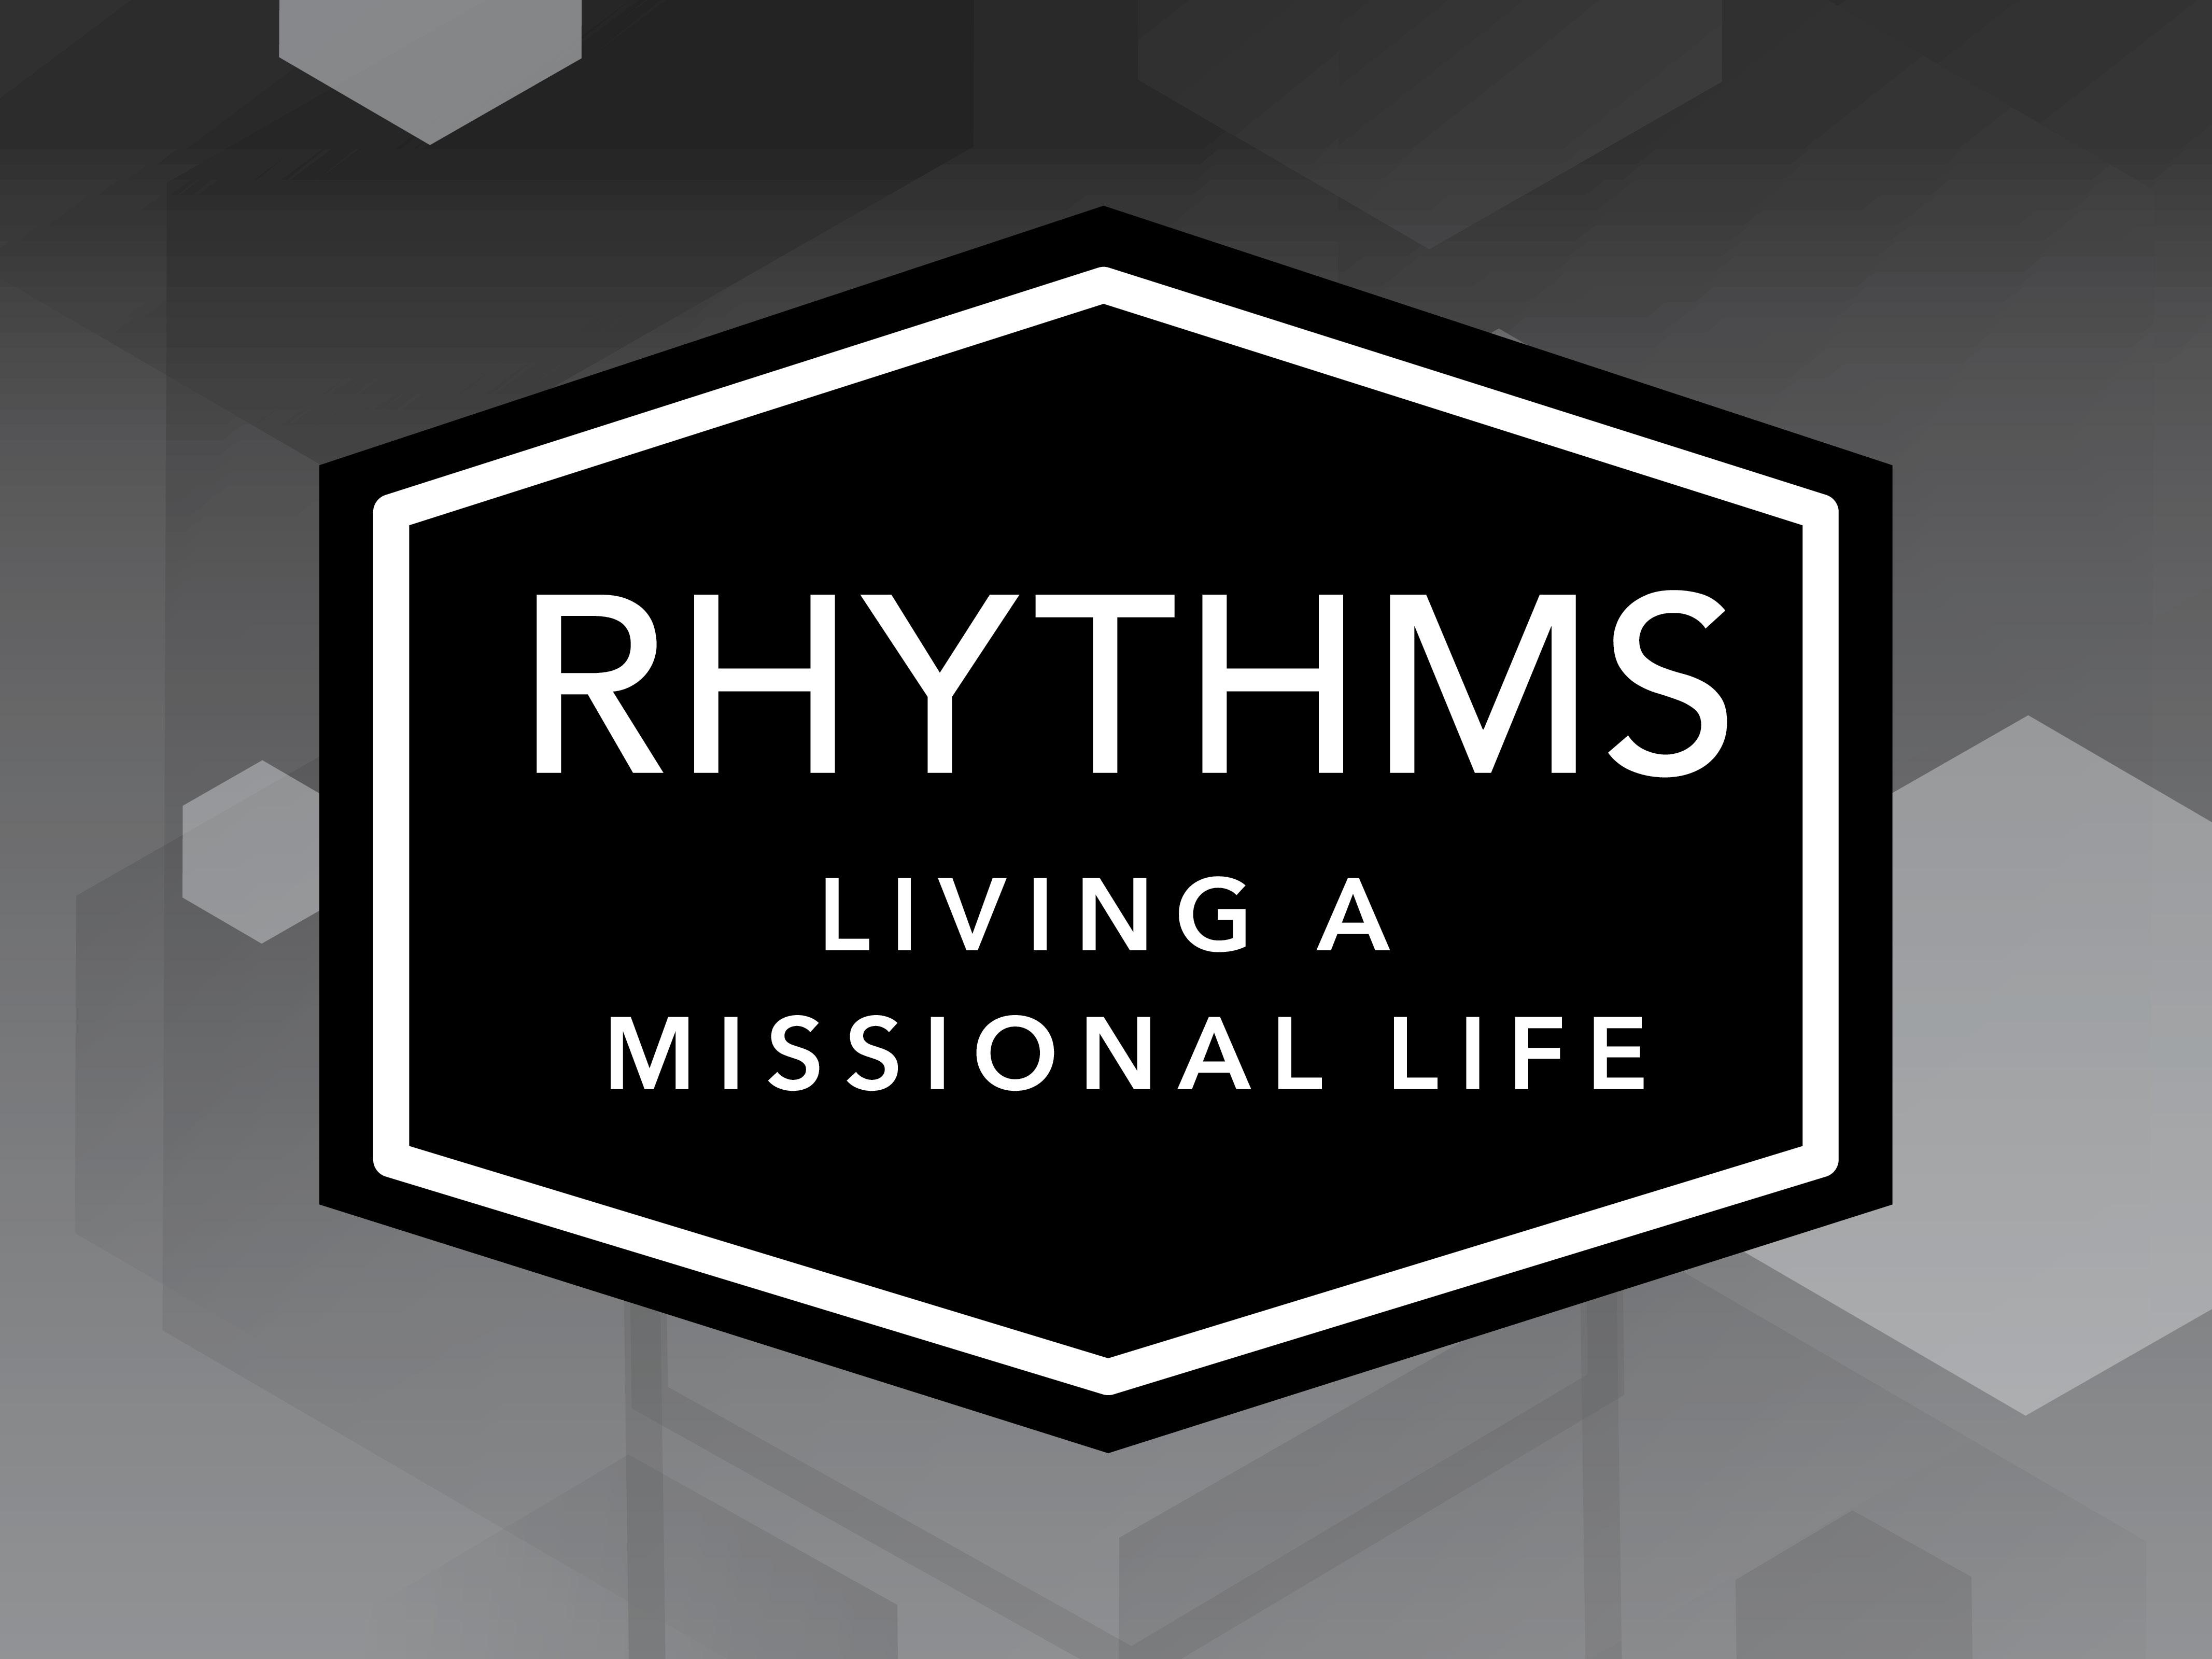 Rhythms pco image